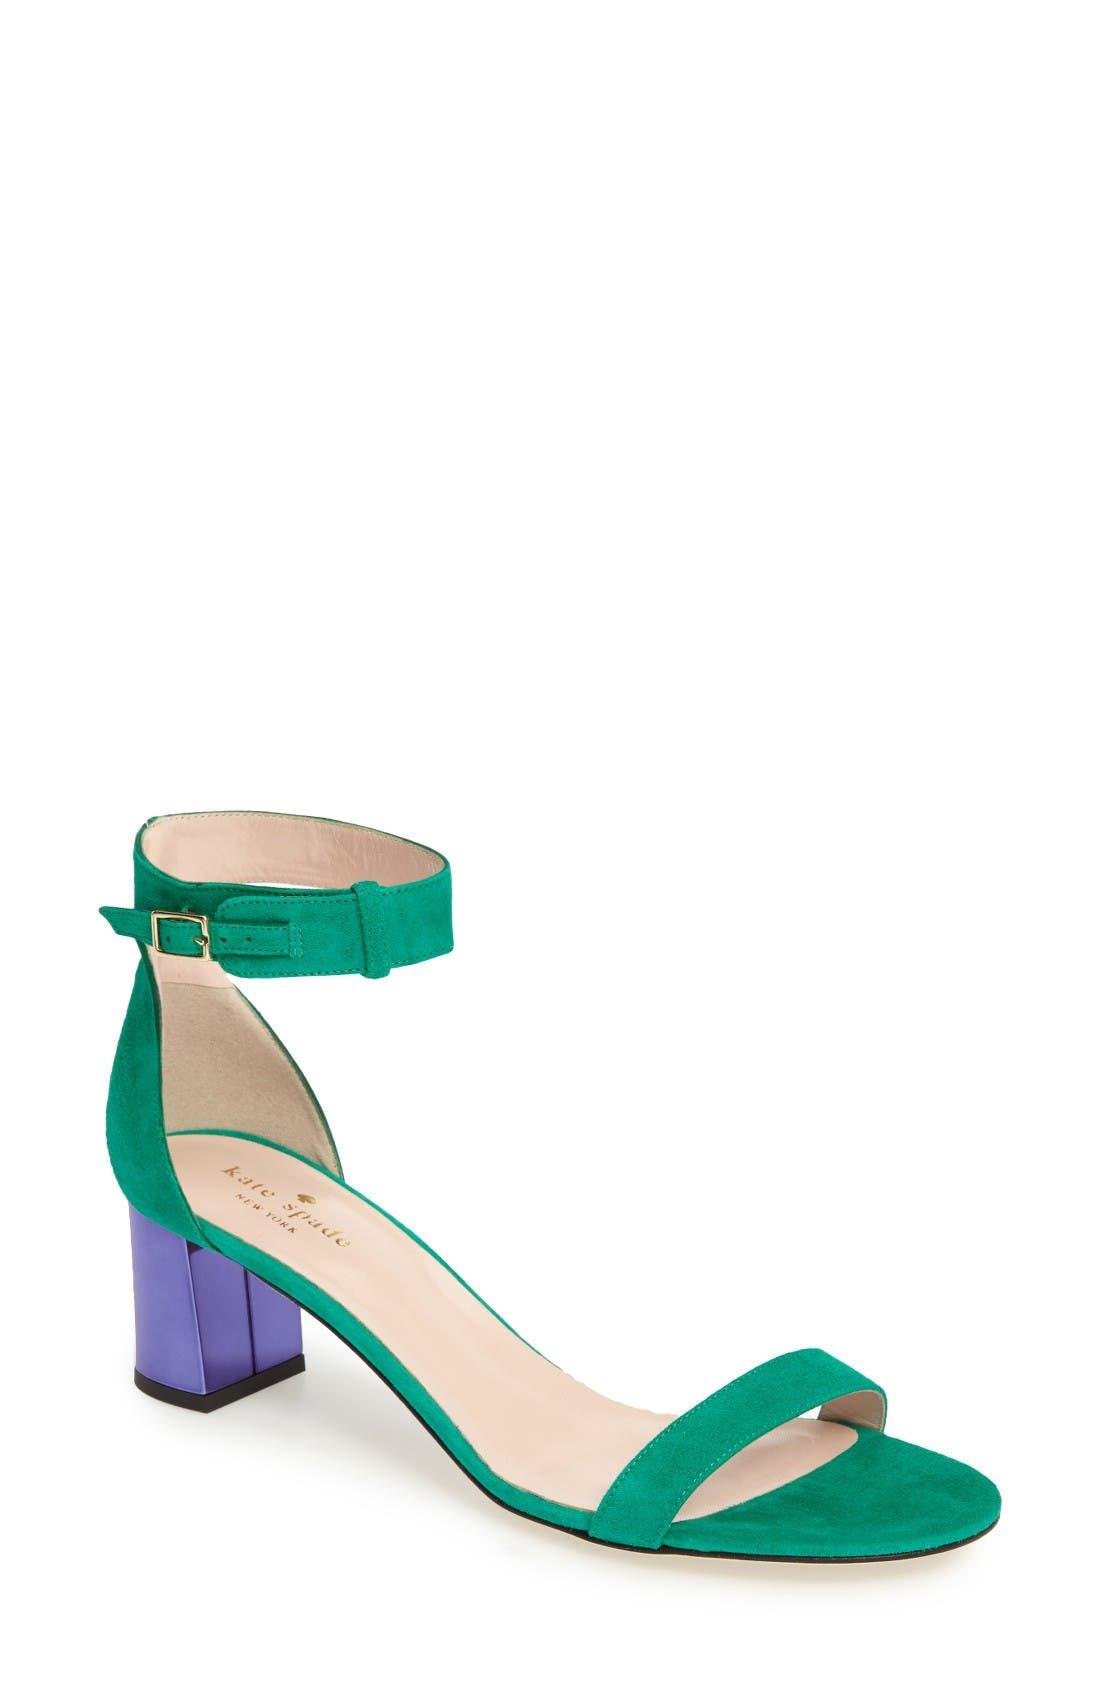 KATE SPADE NEW YORK menorca ankle strap sandal